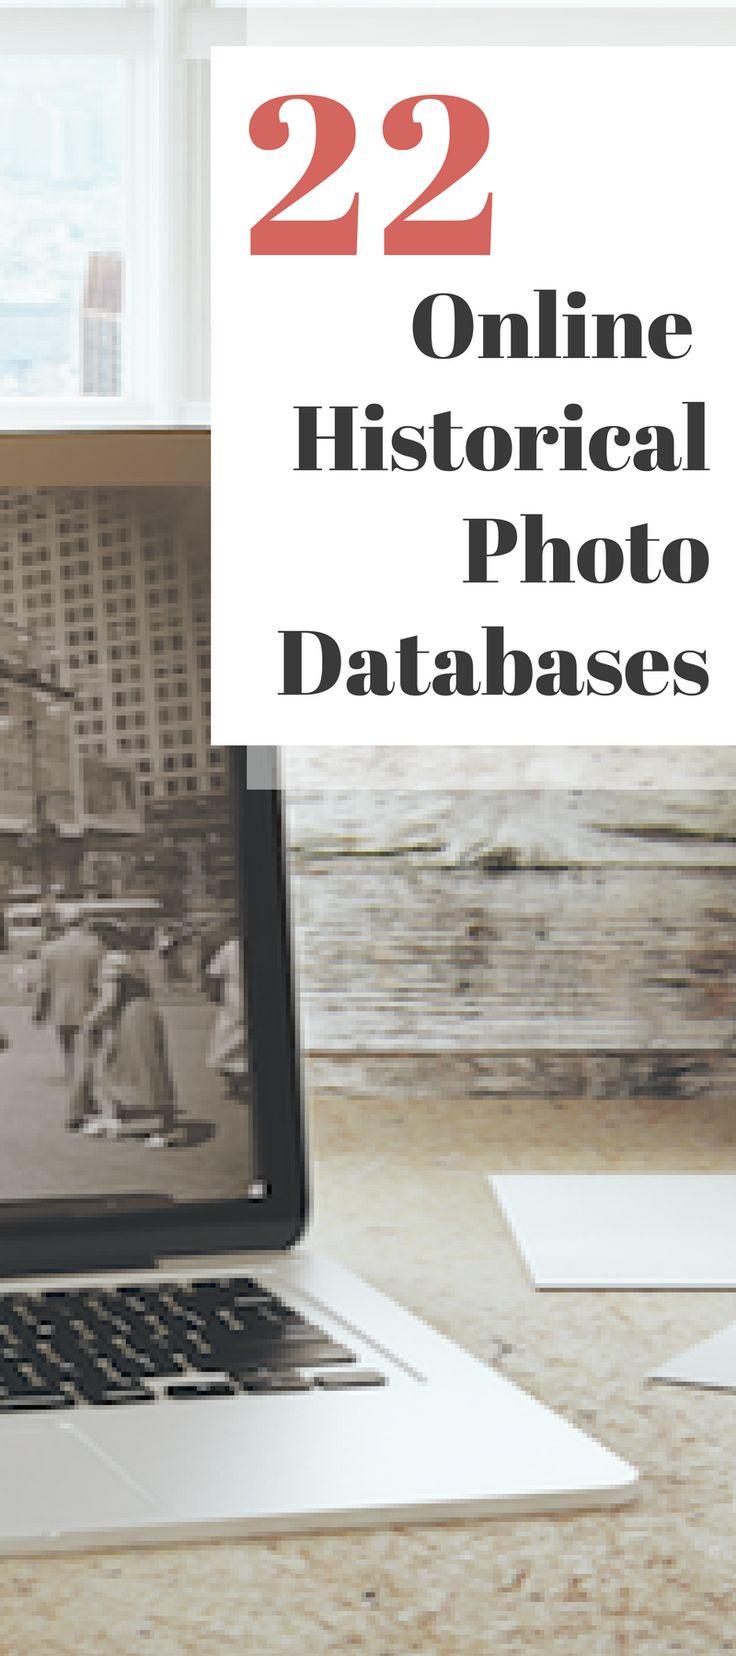 22 Online Historical Photo Databases